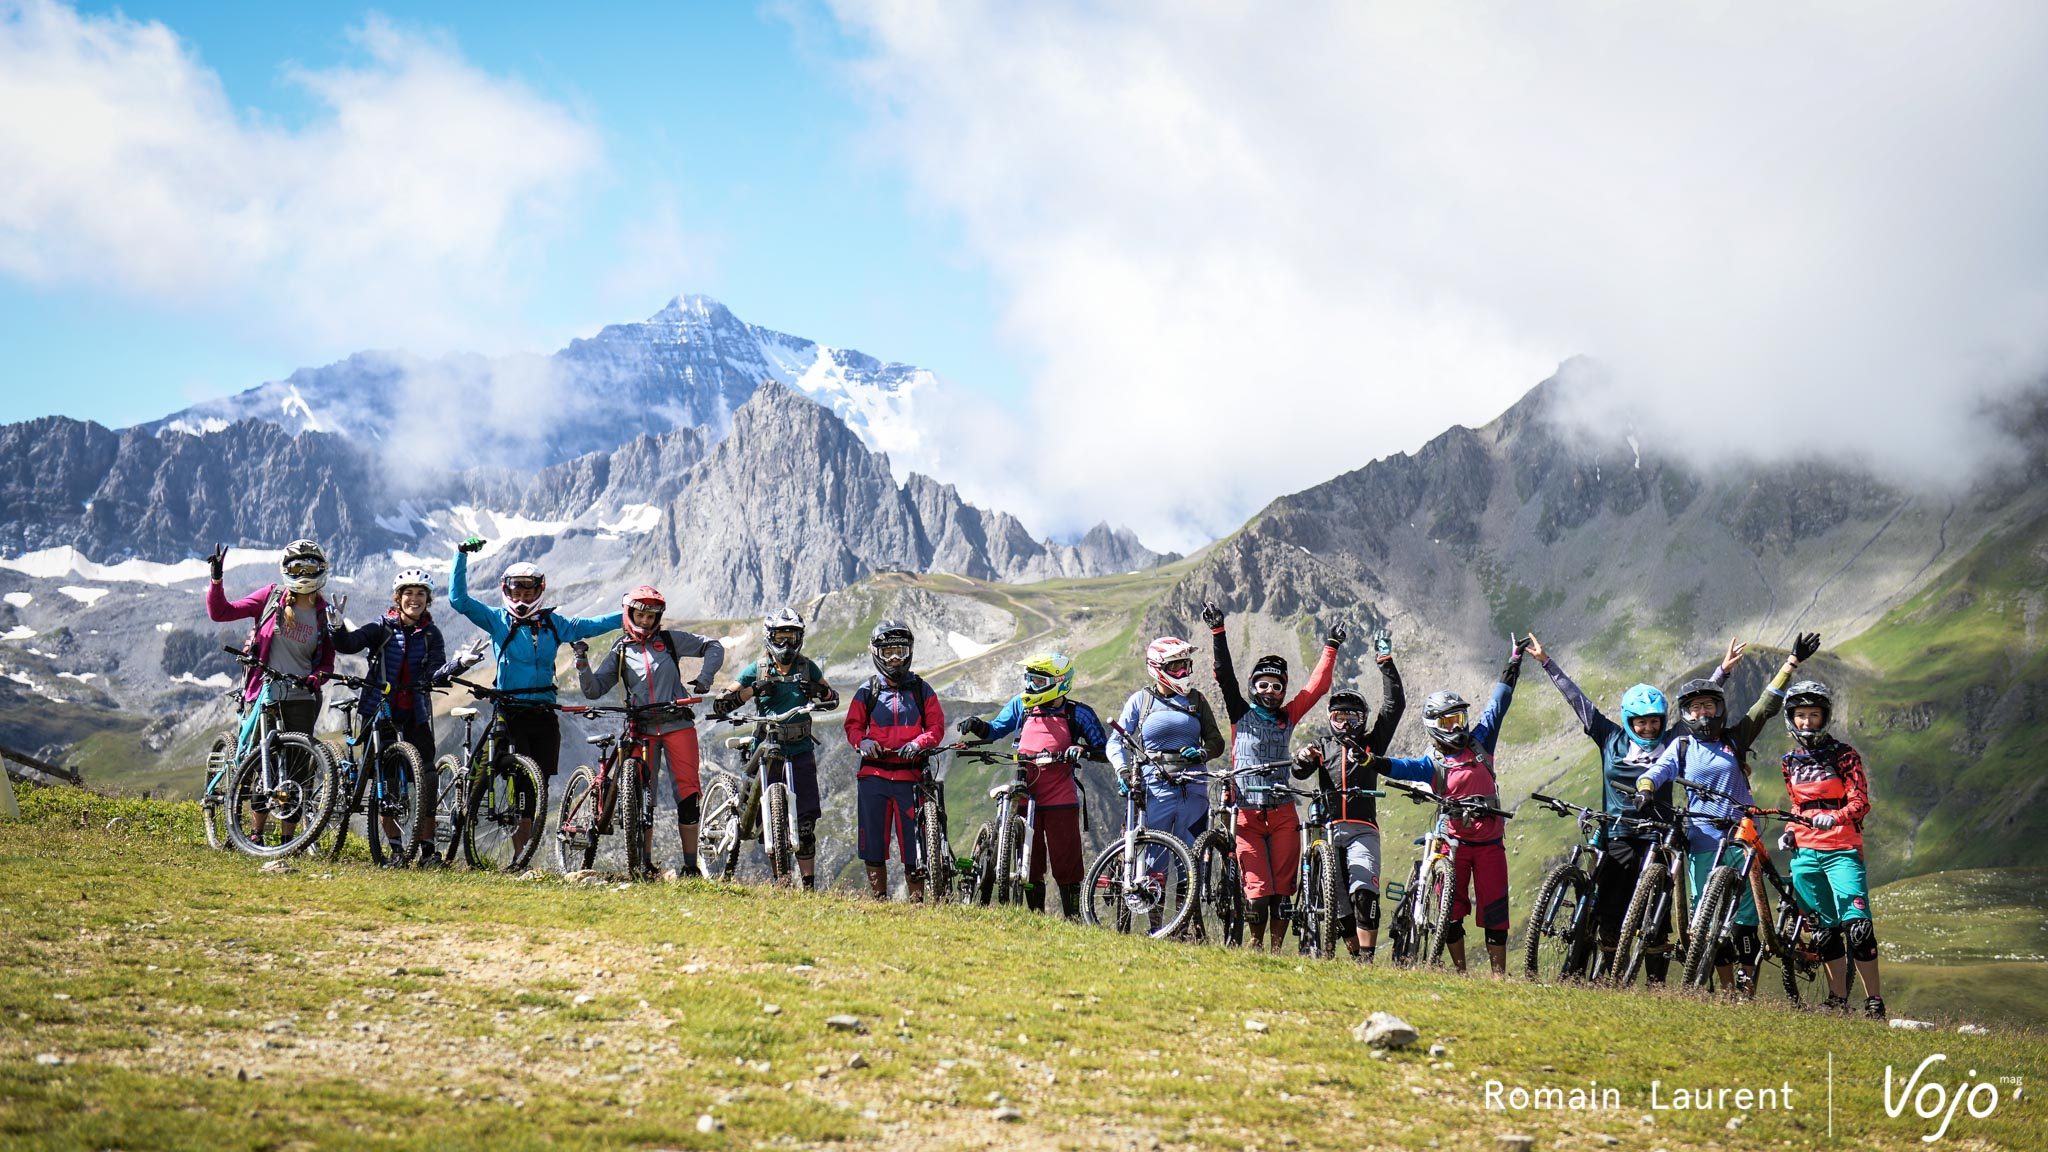 les_bikettes_journee_chatons_tignes_2016_vojo-22